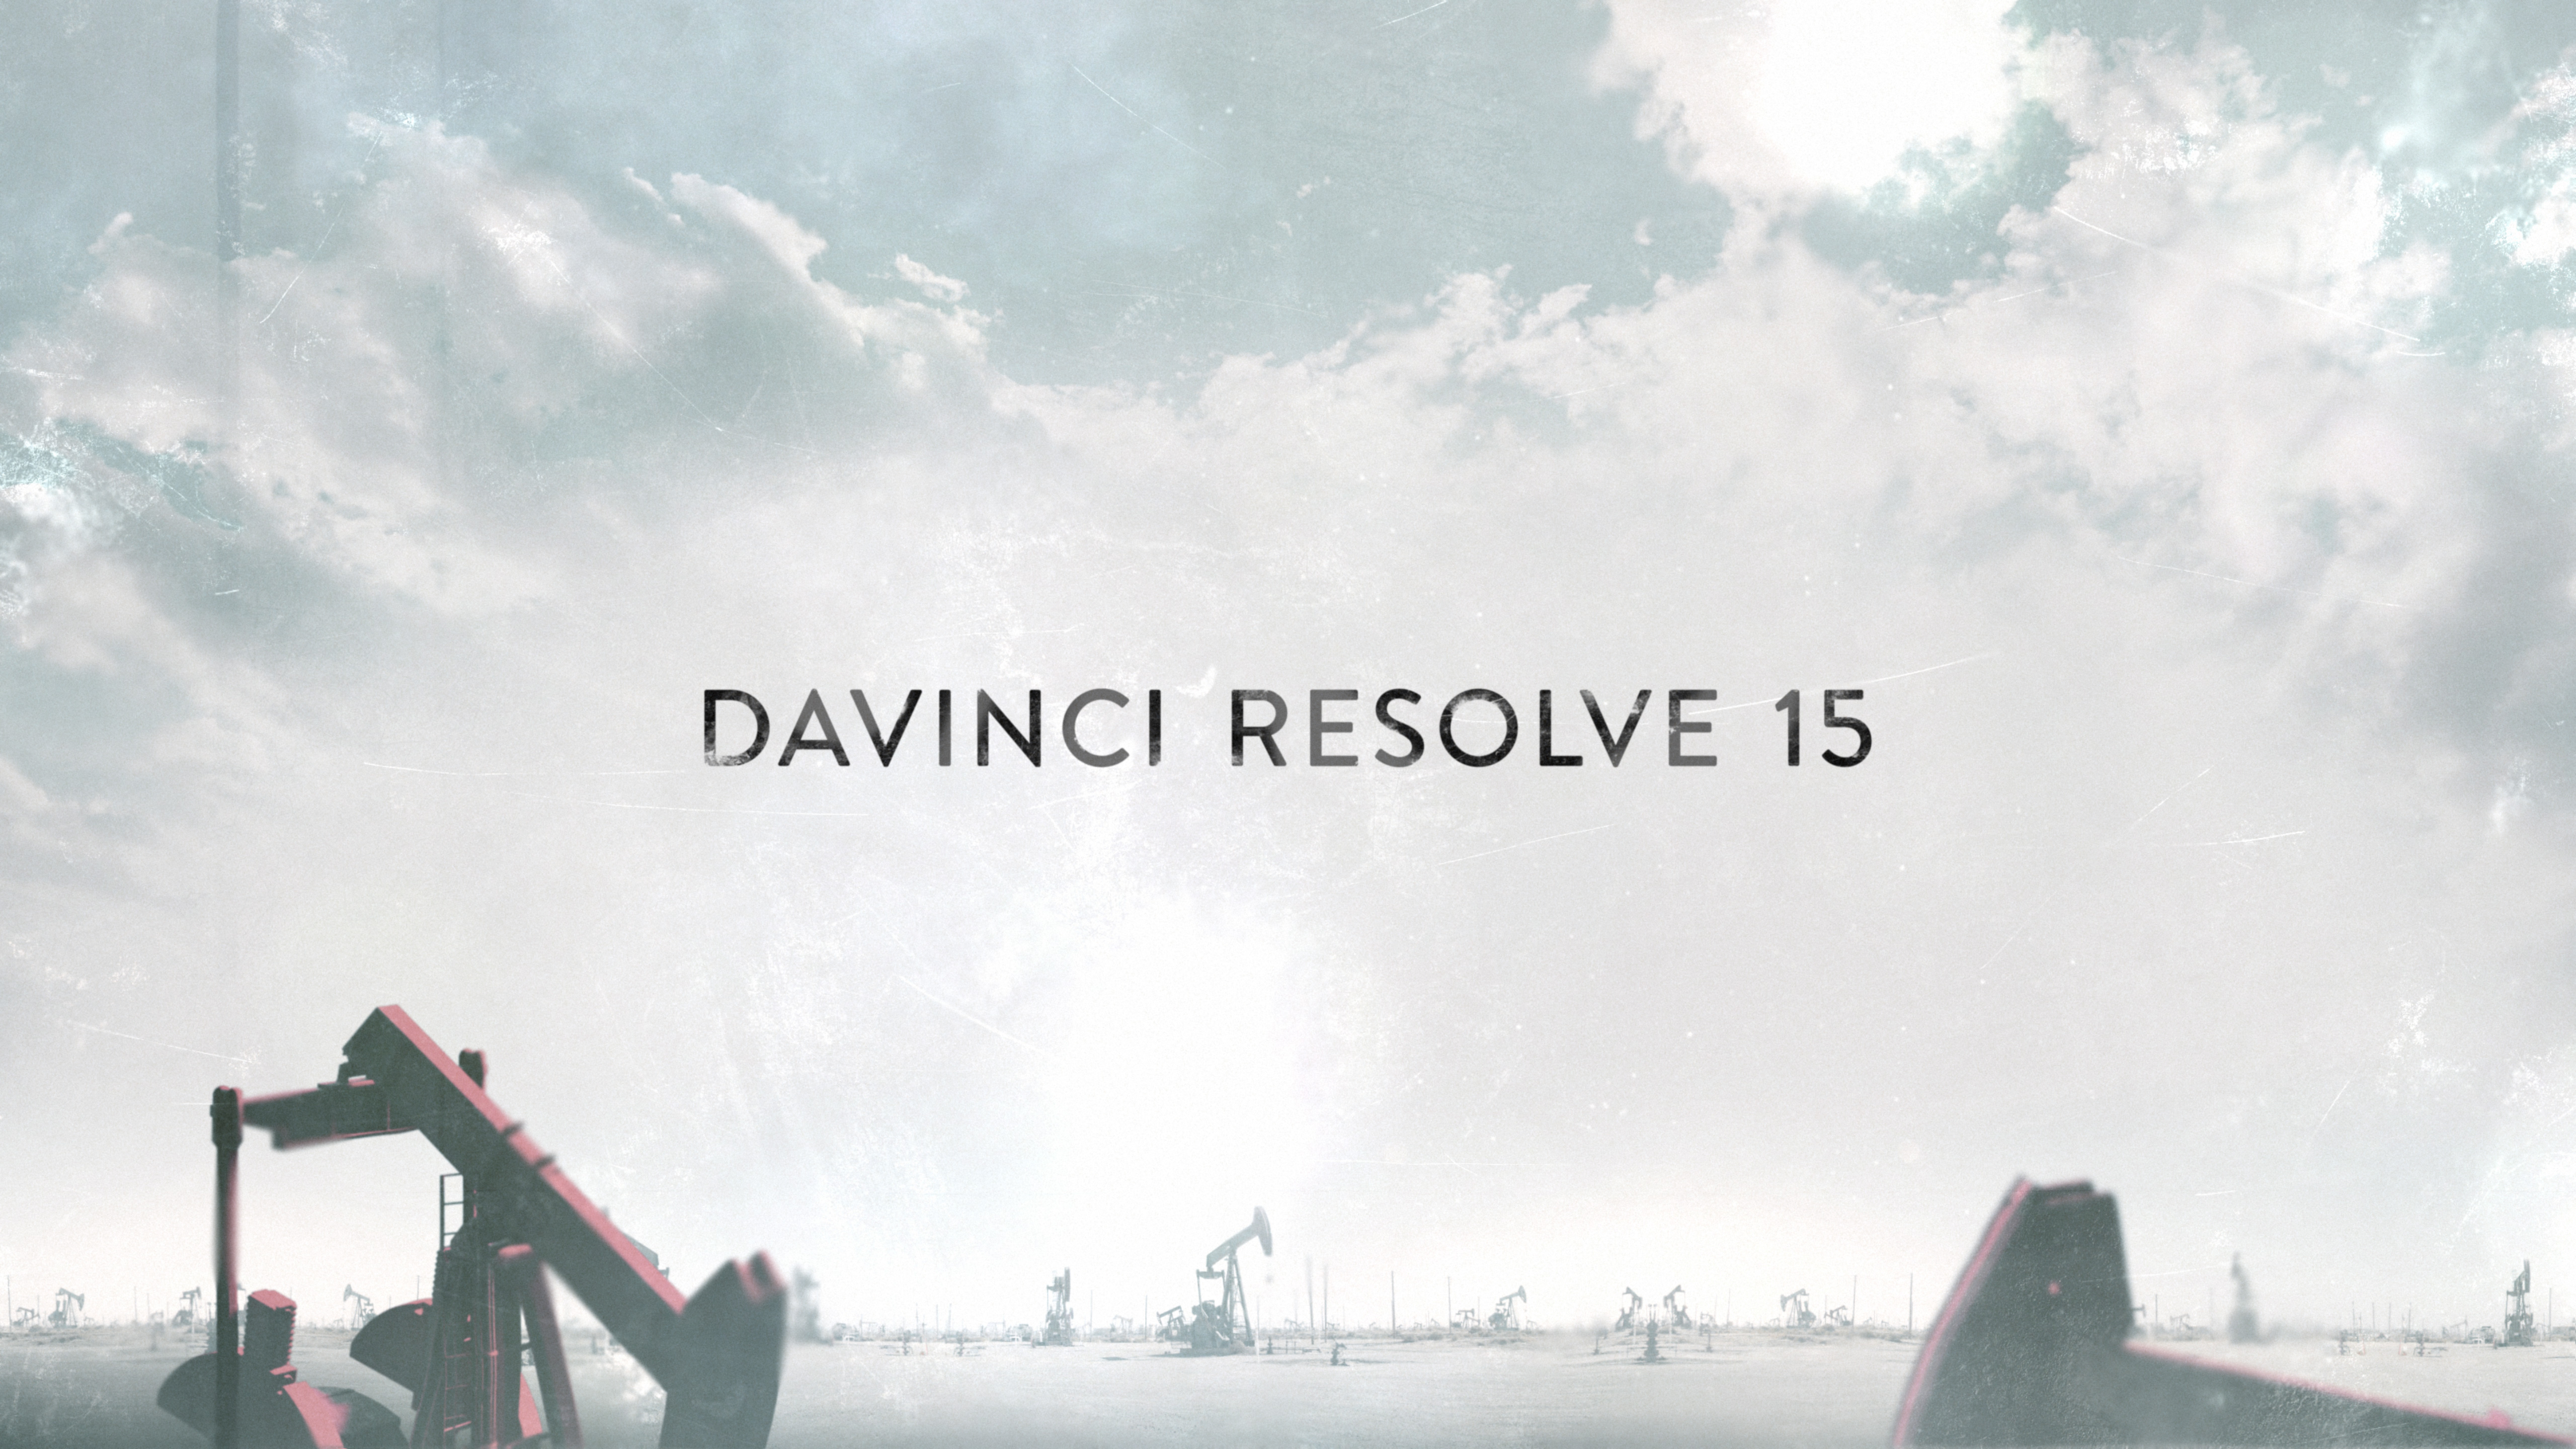 Davinci resolve blackmagic design